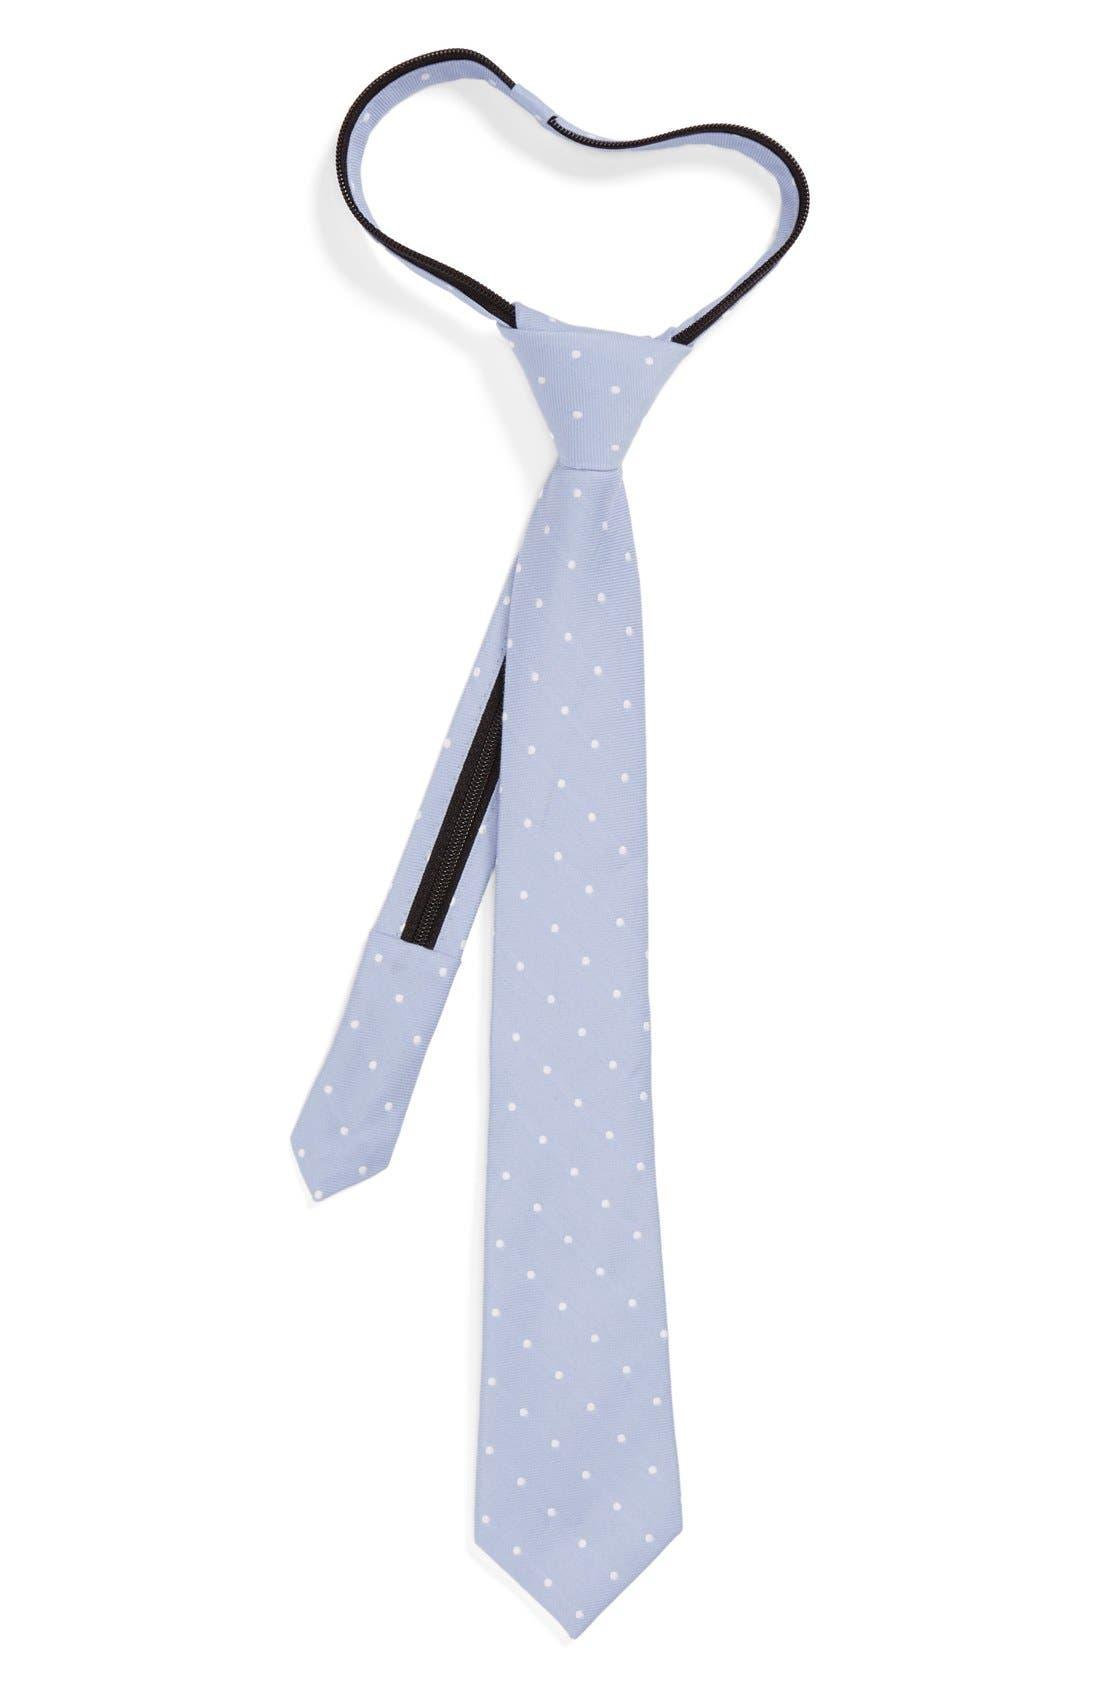 Main Image - Nordstrom Cotton & Silk Zipper Tie (Big Boys)